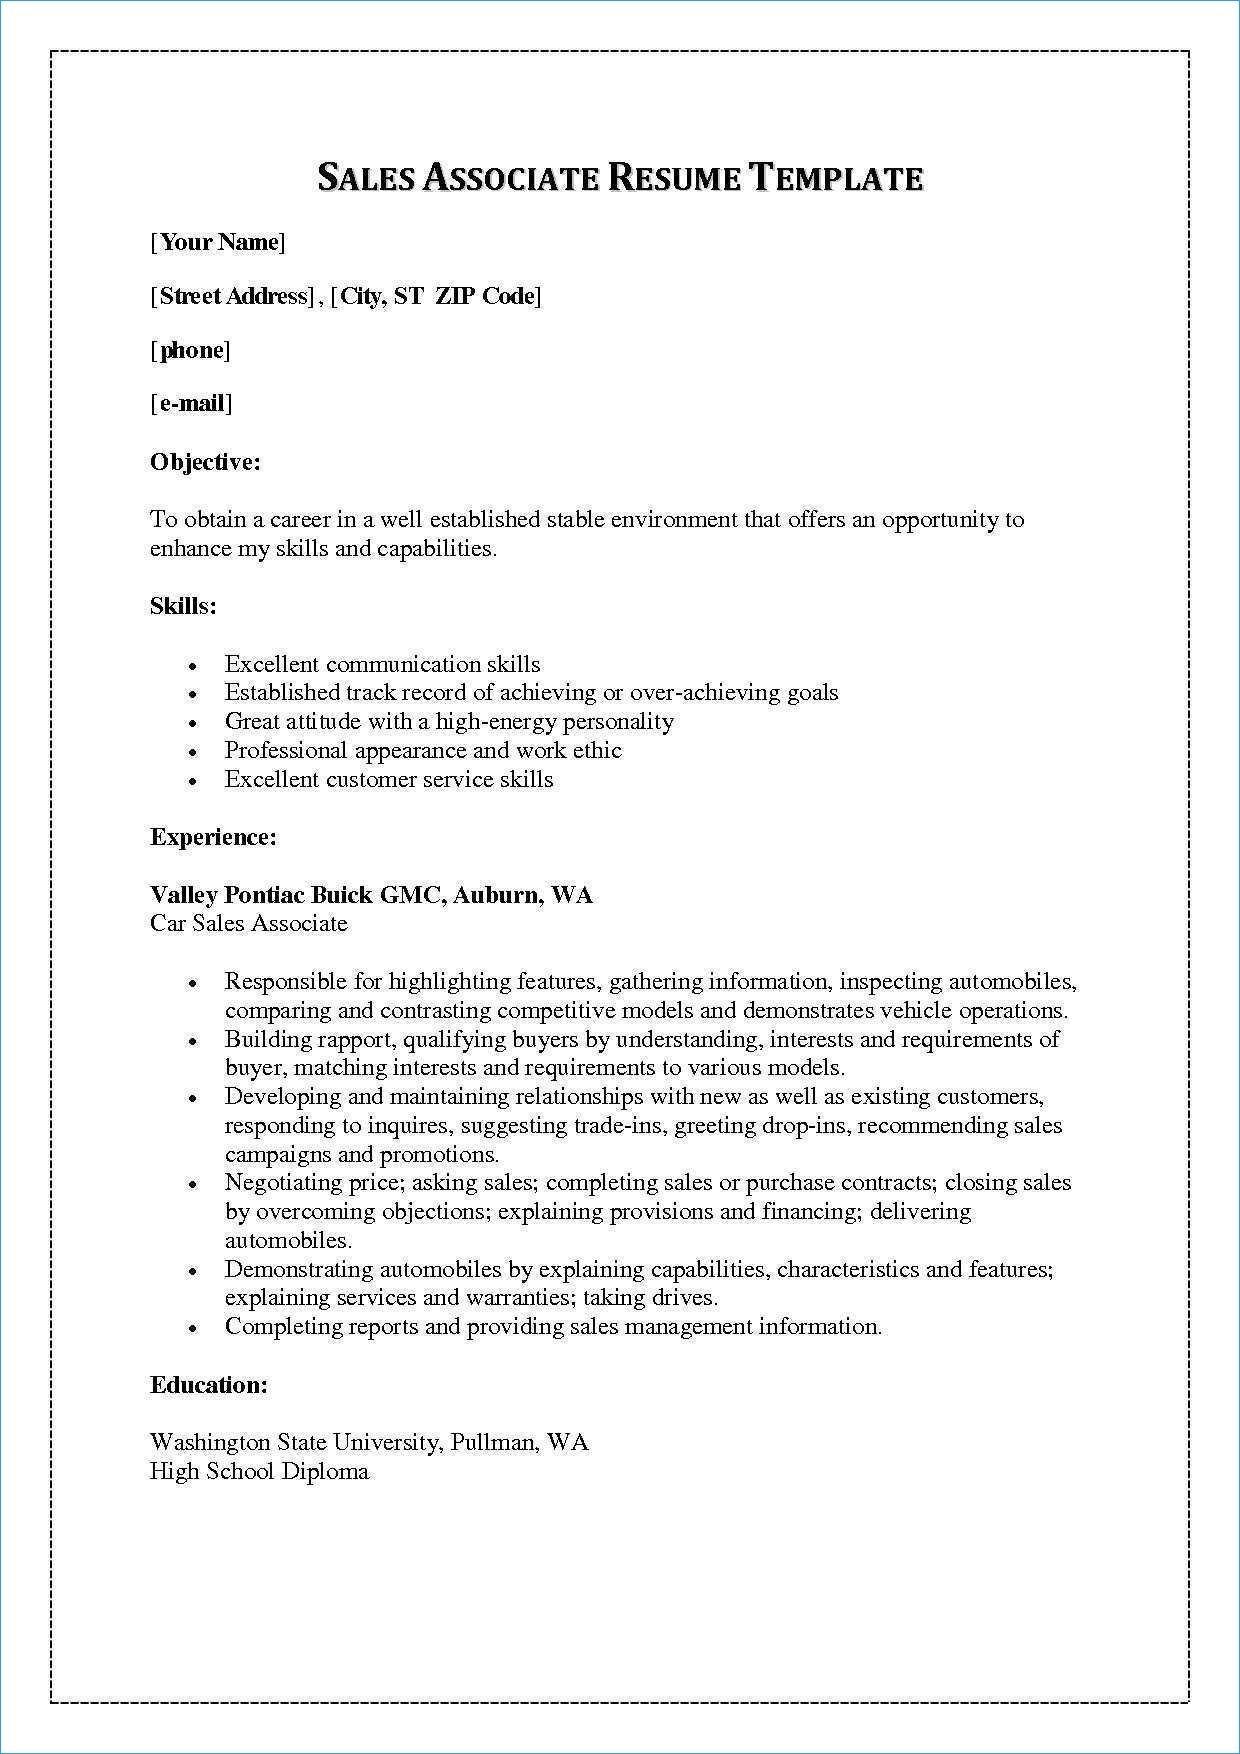 Sample Customer Service Resume lettersampel letterformat